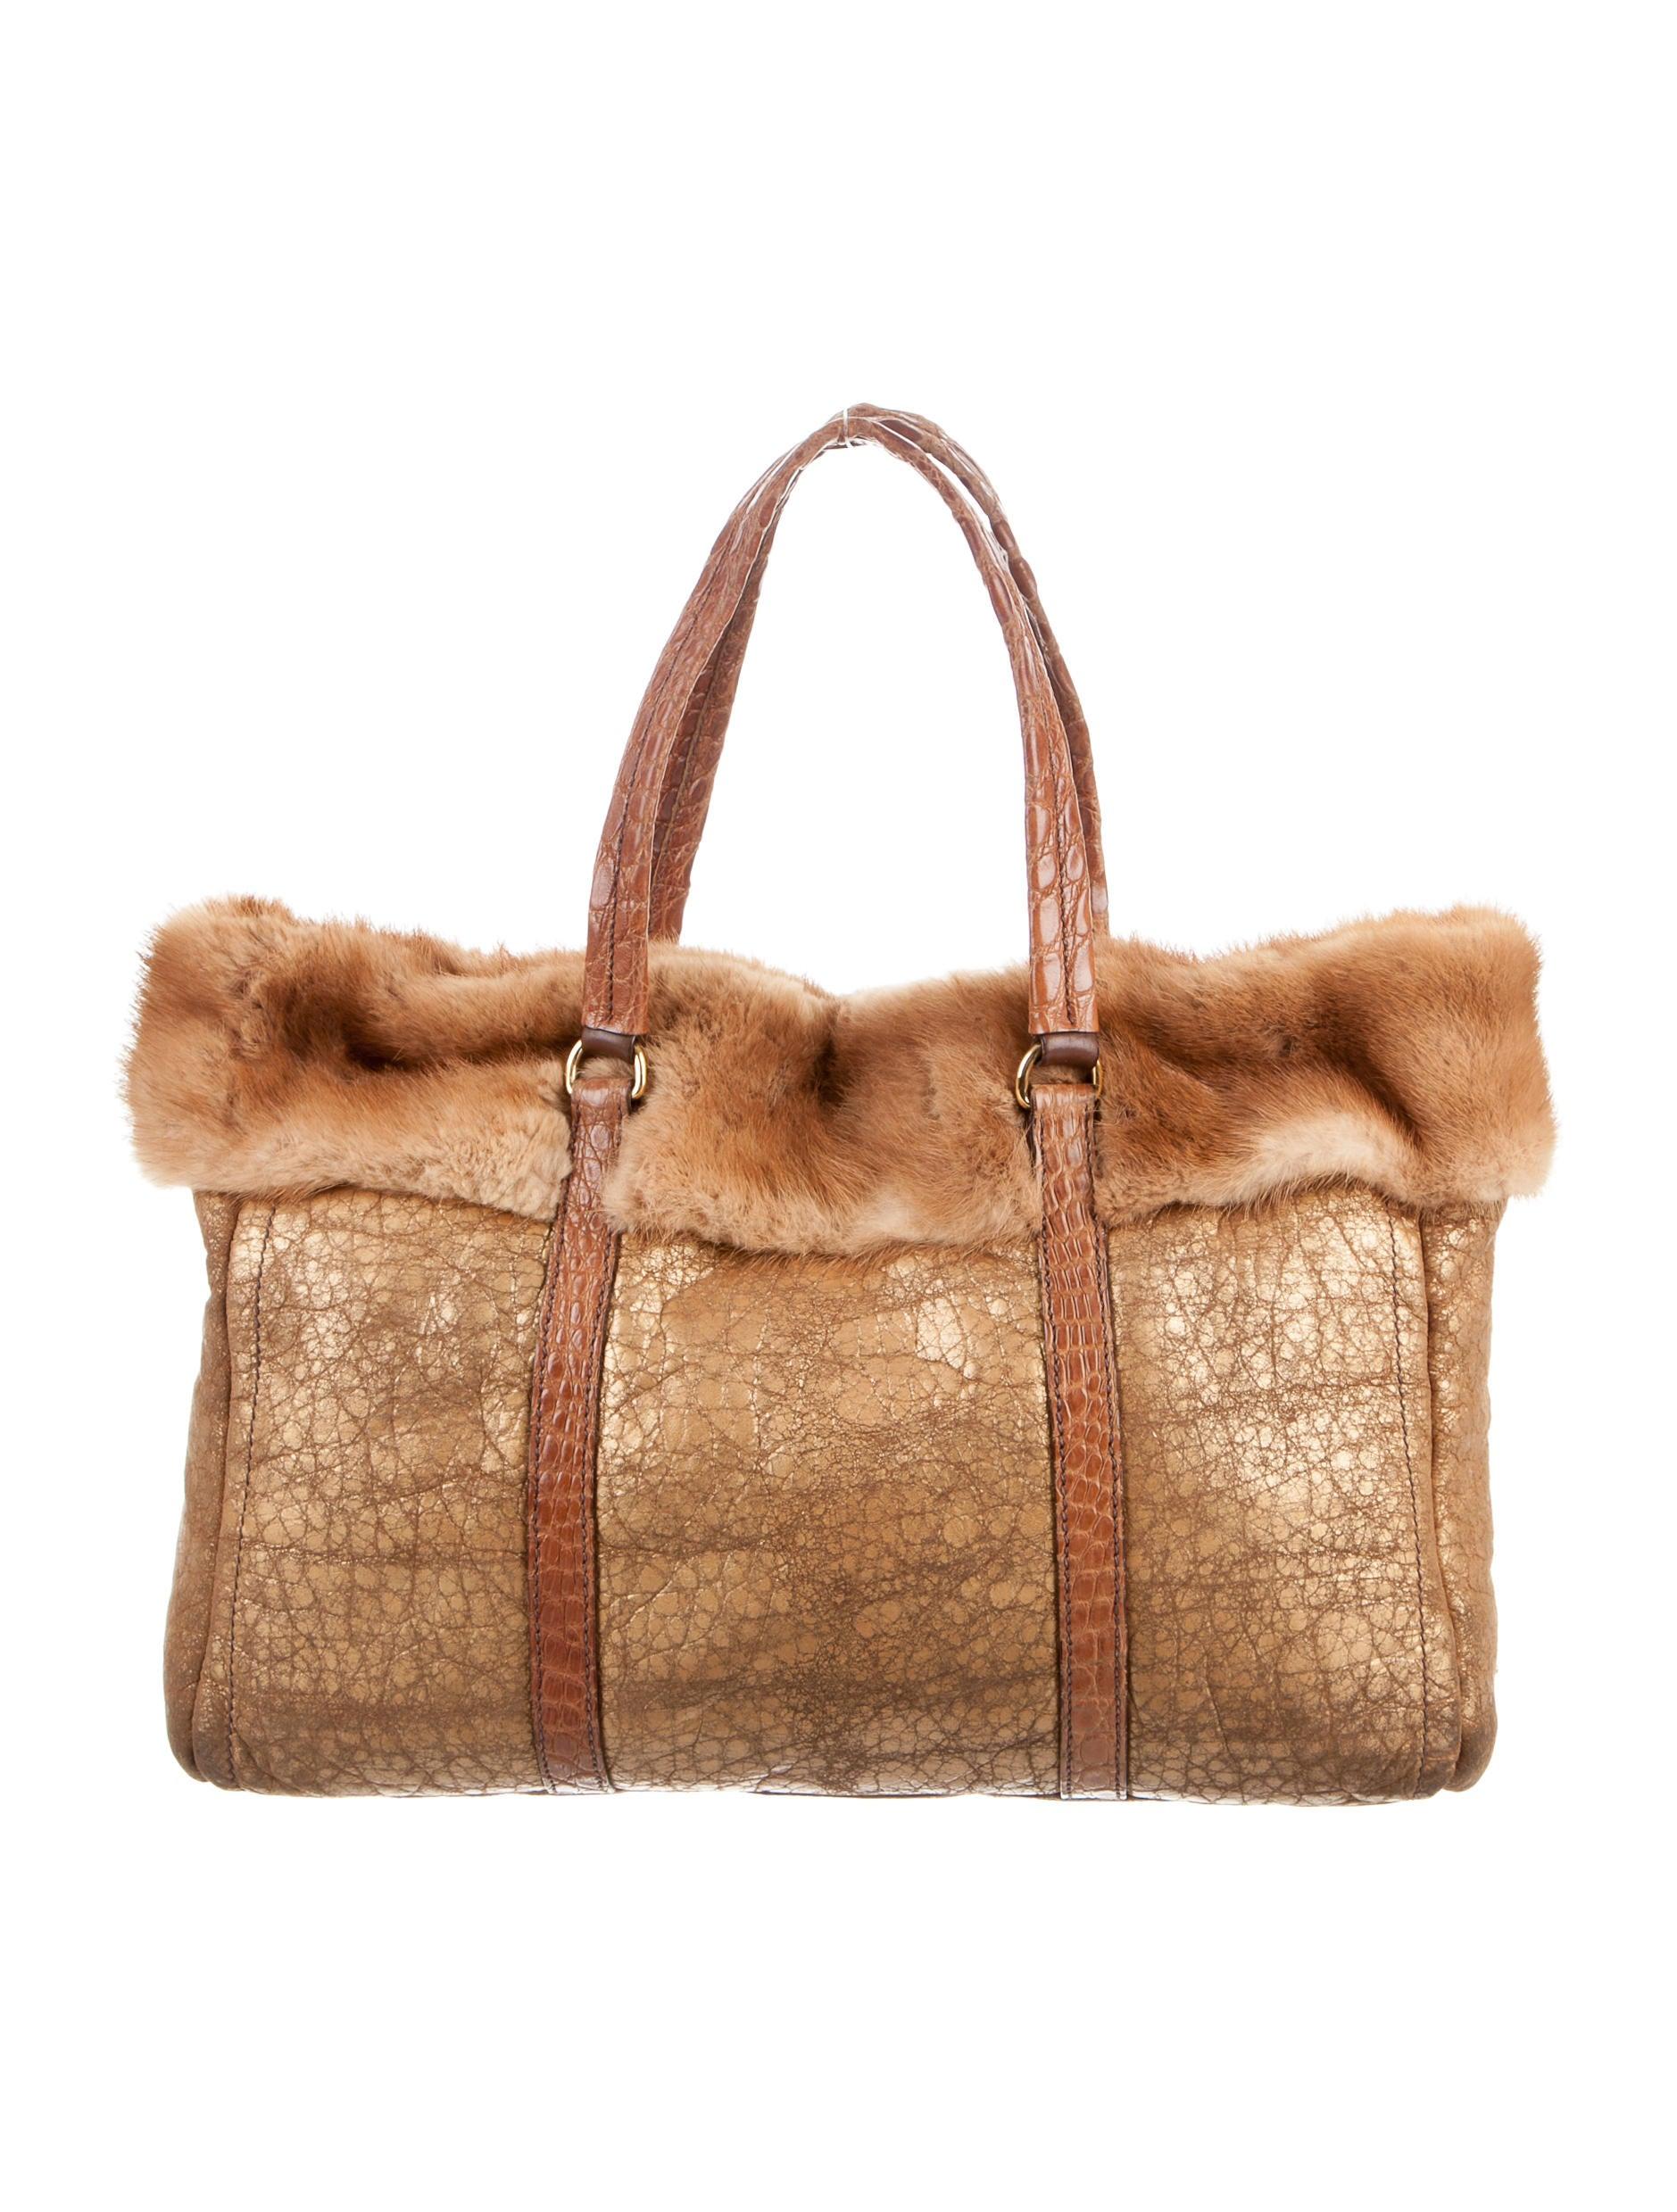 7eec2152639d Prada Mink-Trimmed Distressed Leather Tote - Handbags - PRA131724 ...